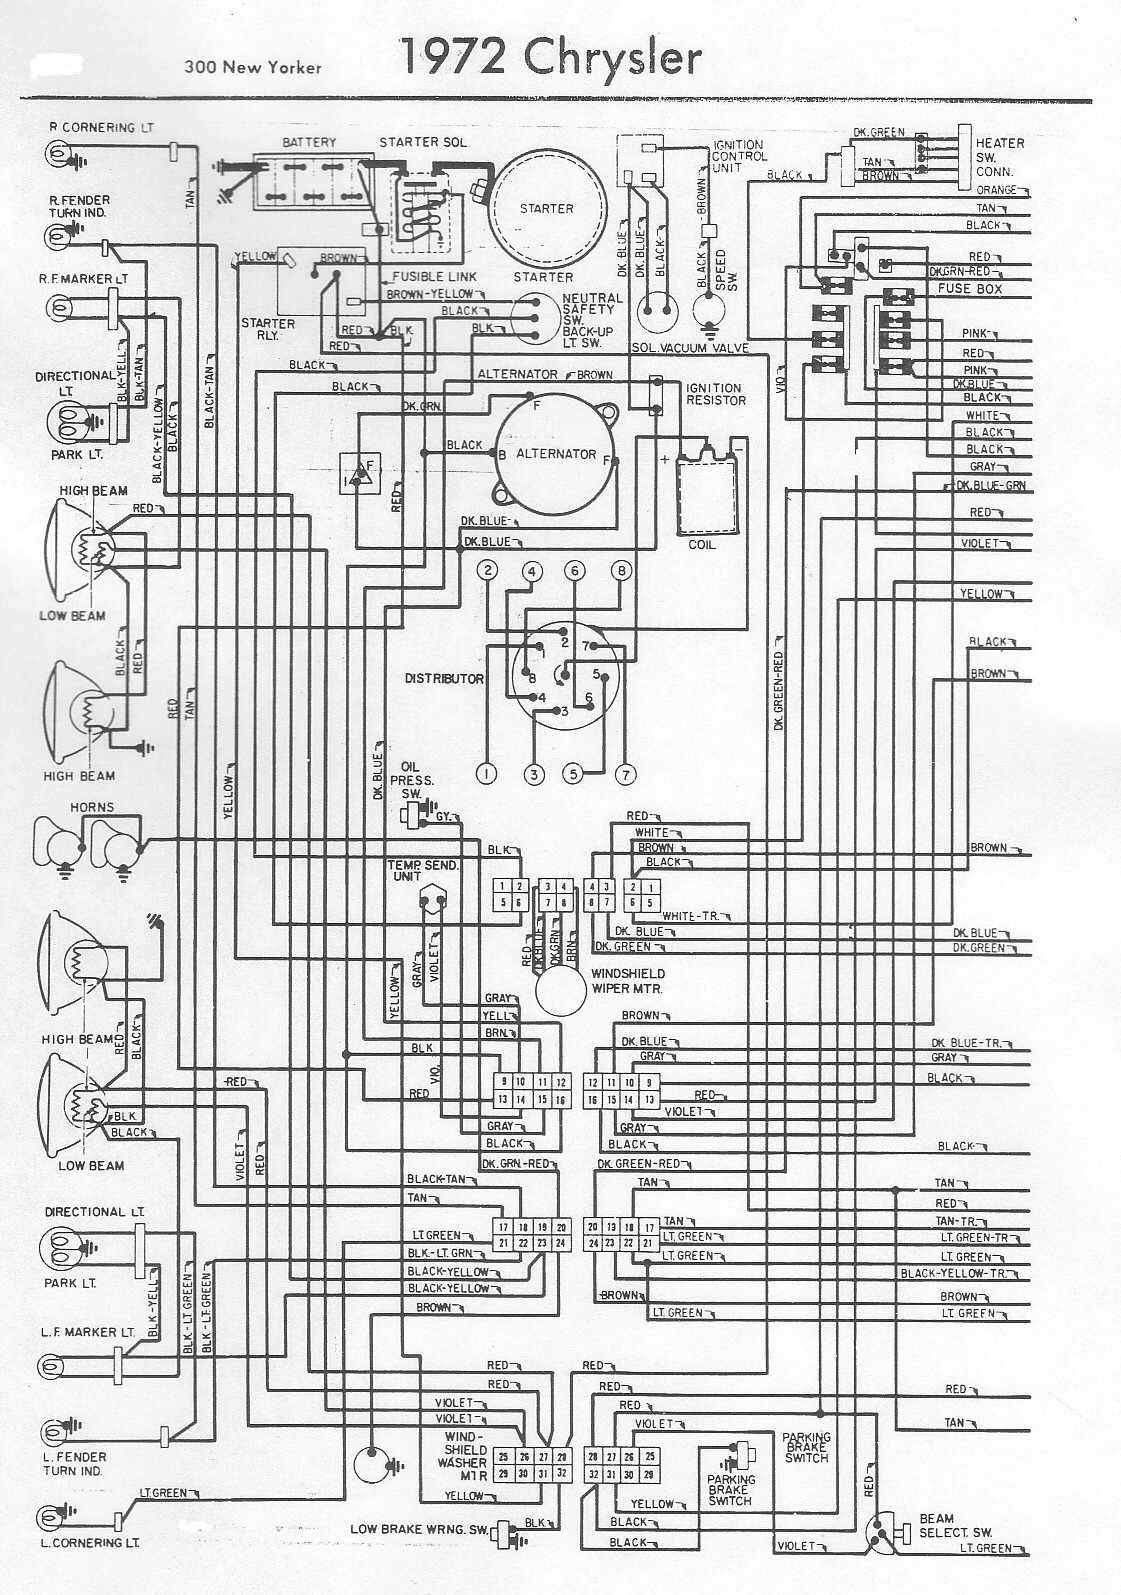 1967 chrysler newport wiring diagram wiring diagram rows chrysler 300 seat wiring diagram chrysler 300 wiring diagram #4